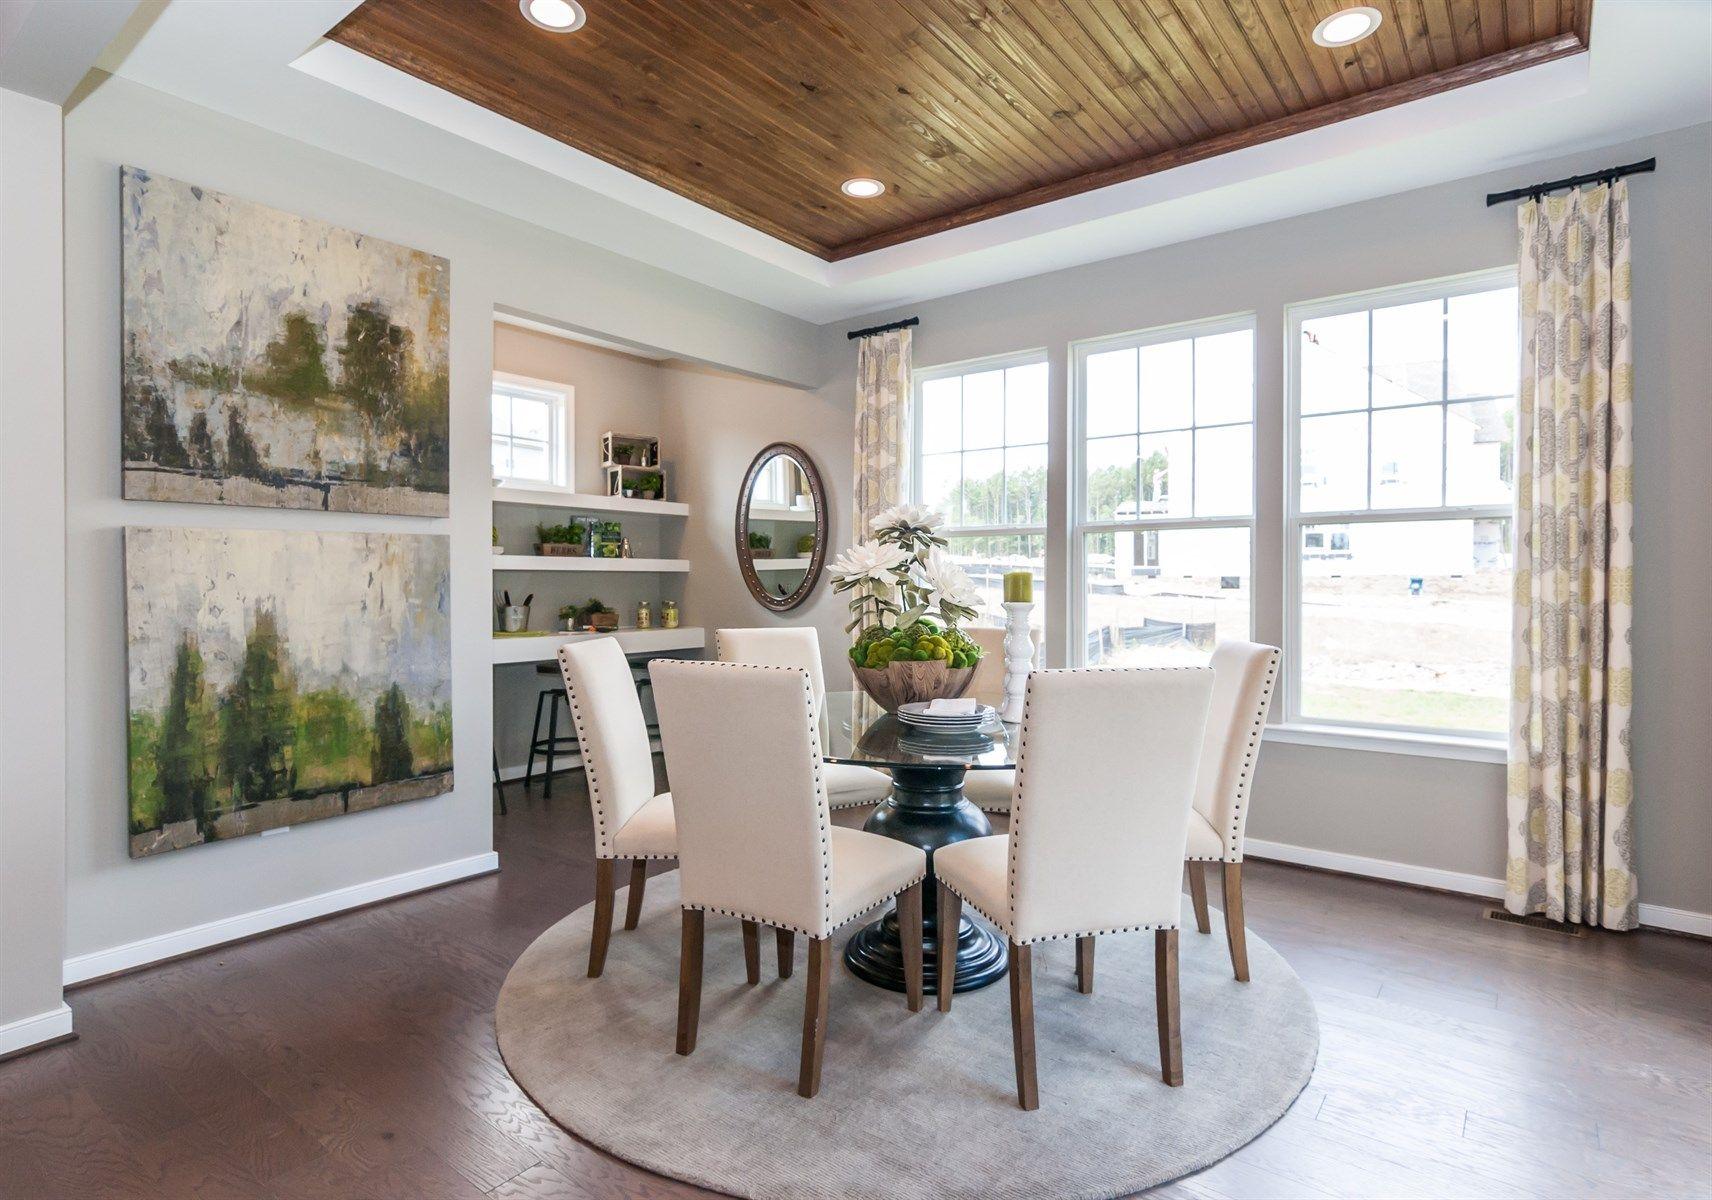 The Morgan Floor Plan At Magnolia Green In Richmond Virginia Magnolia Green Home New Home Communities